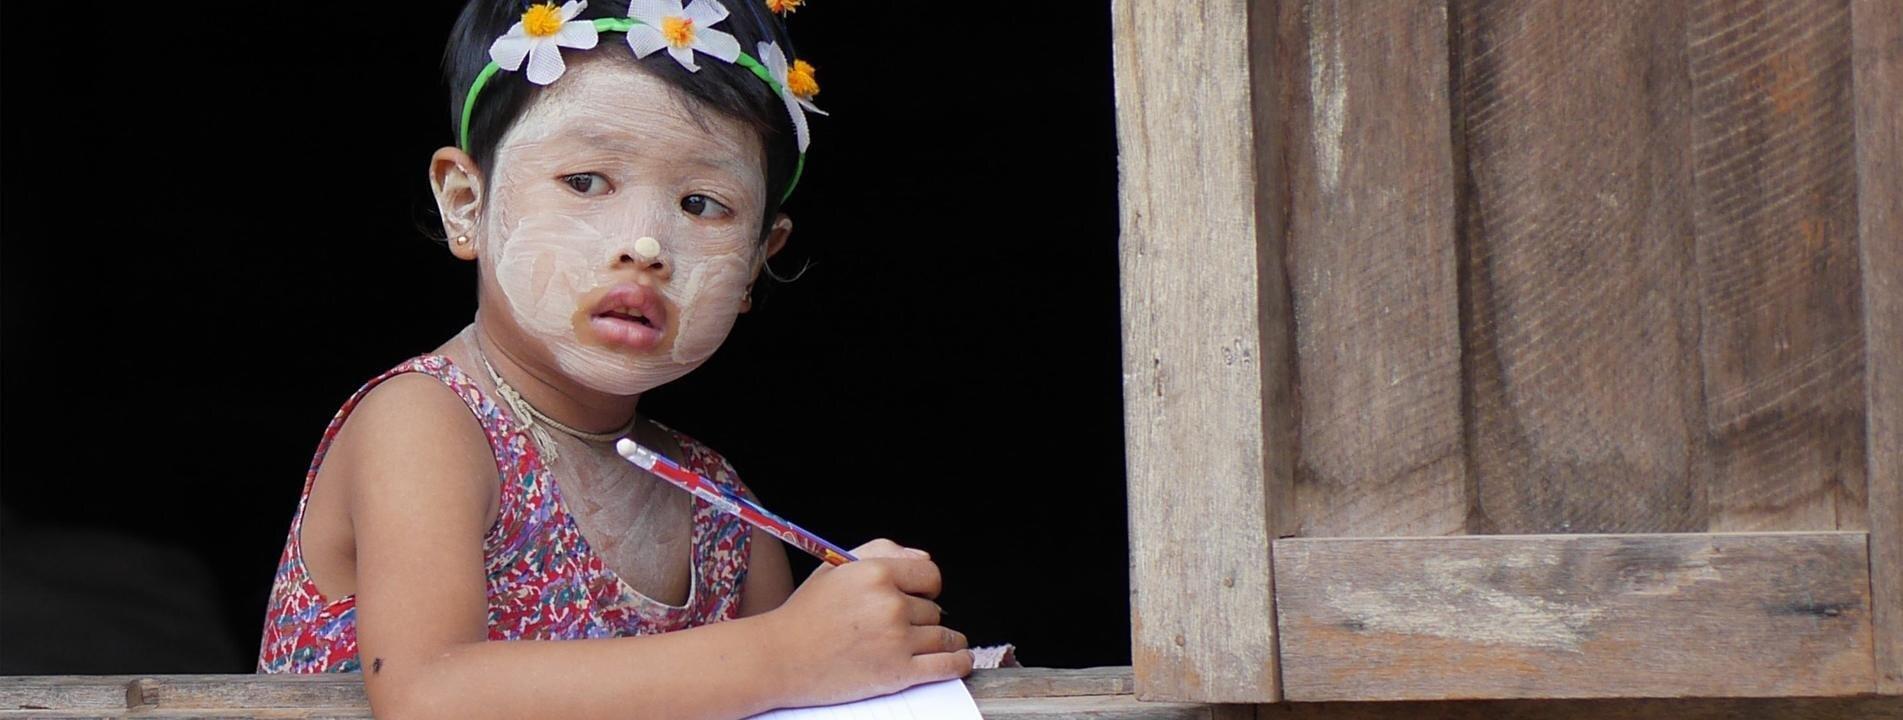 A little Burmese girl by the window